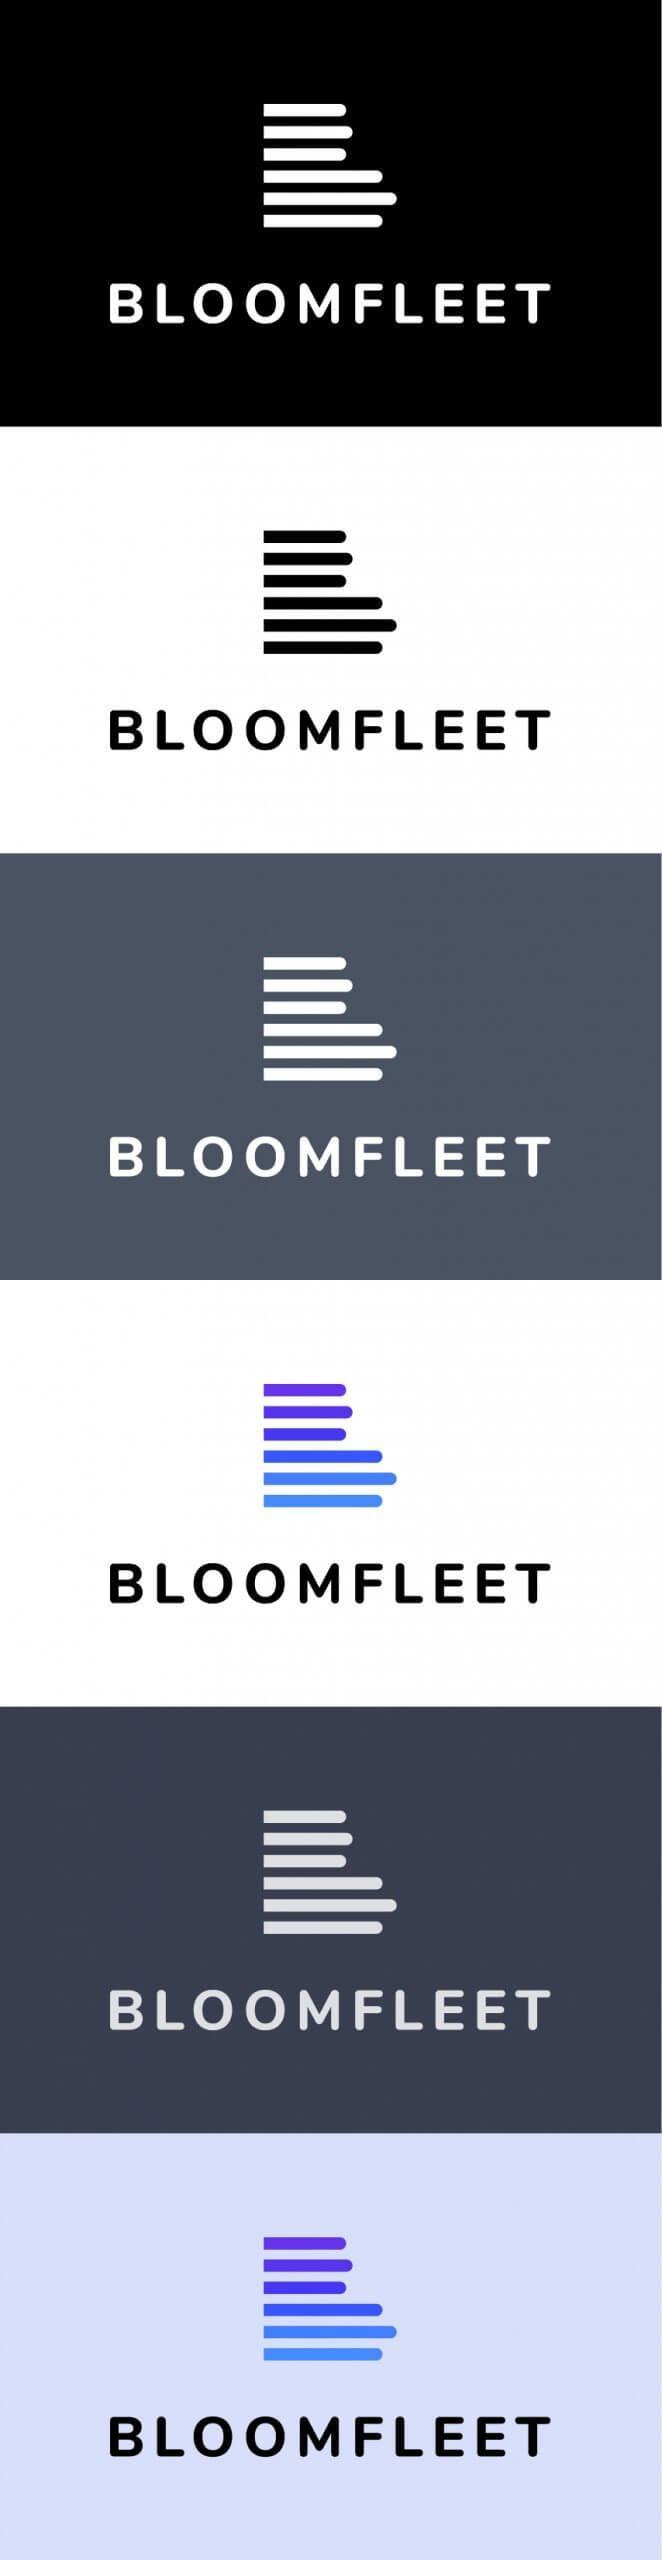 Group 218s6 scaled Bloomfleet 3 Baasbox